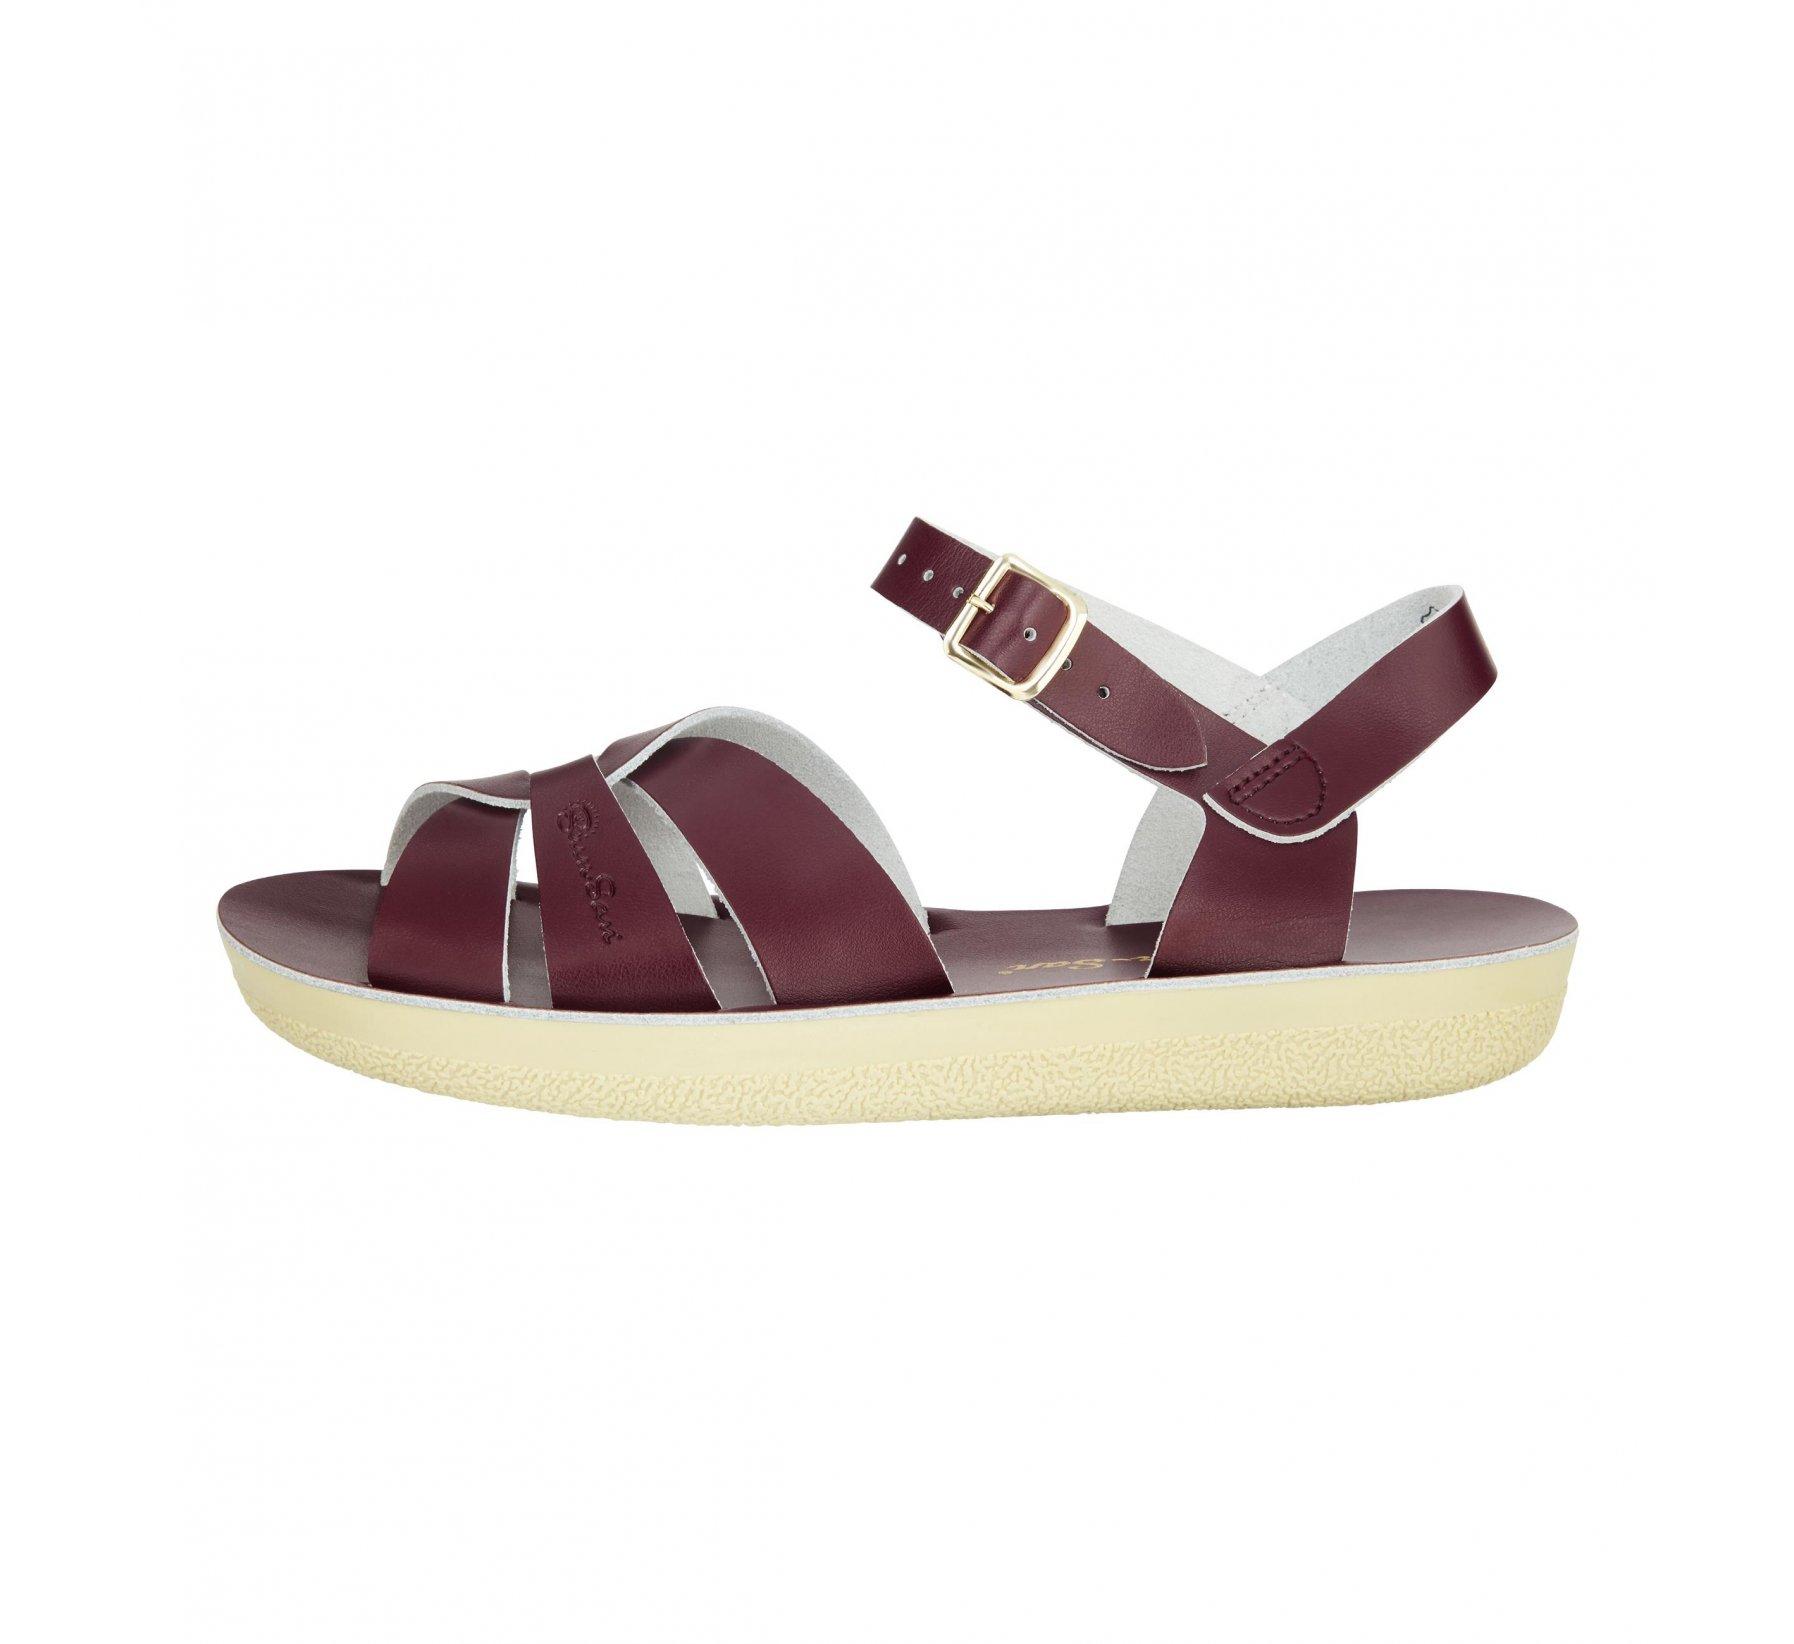 Swimmer Claret Sandal - Salt Water Sandals